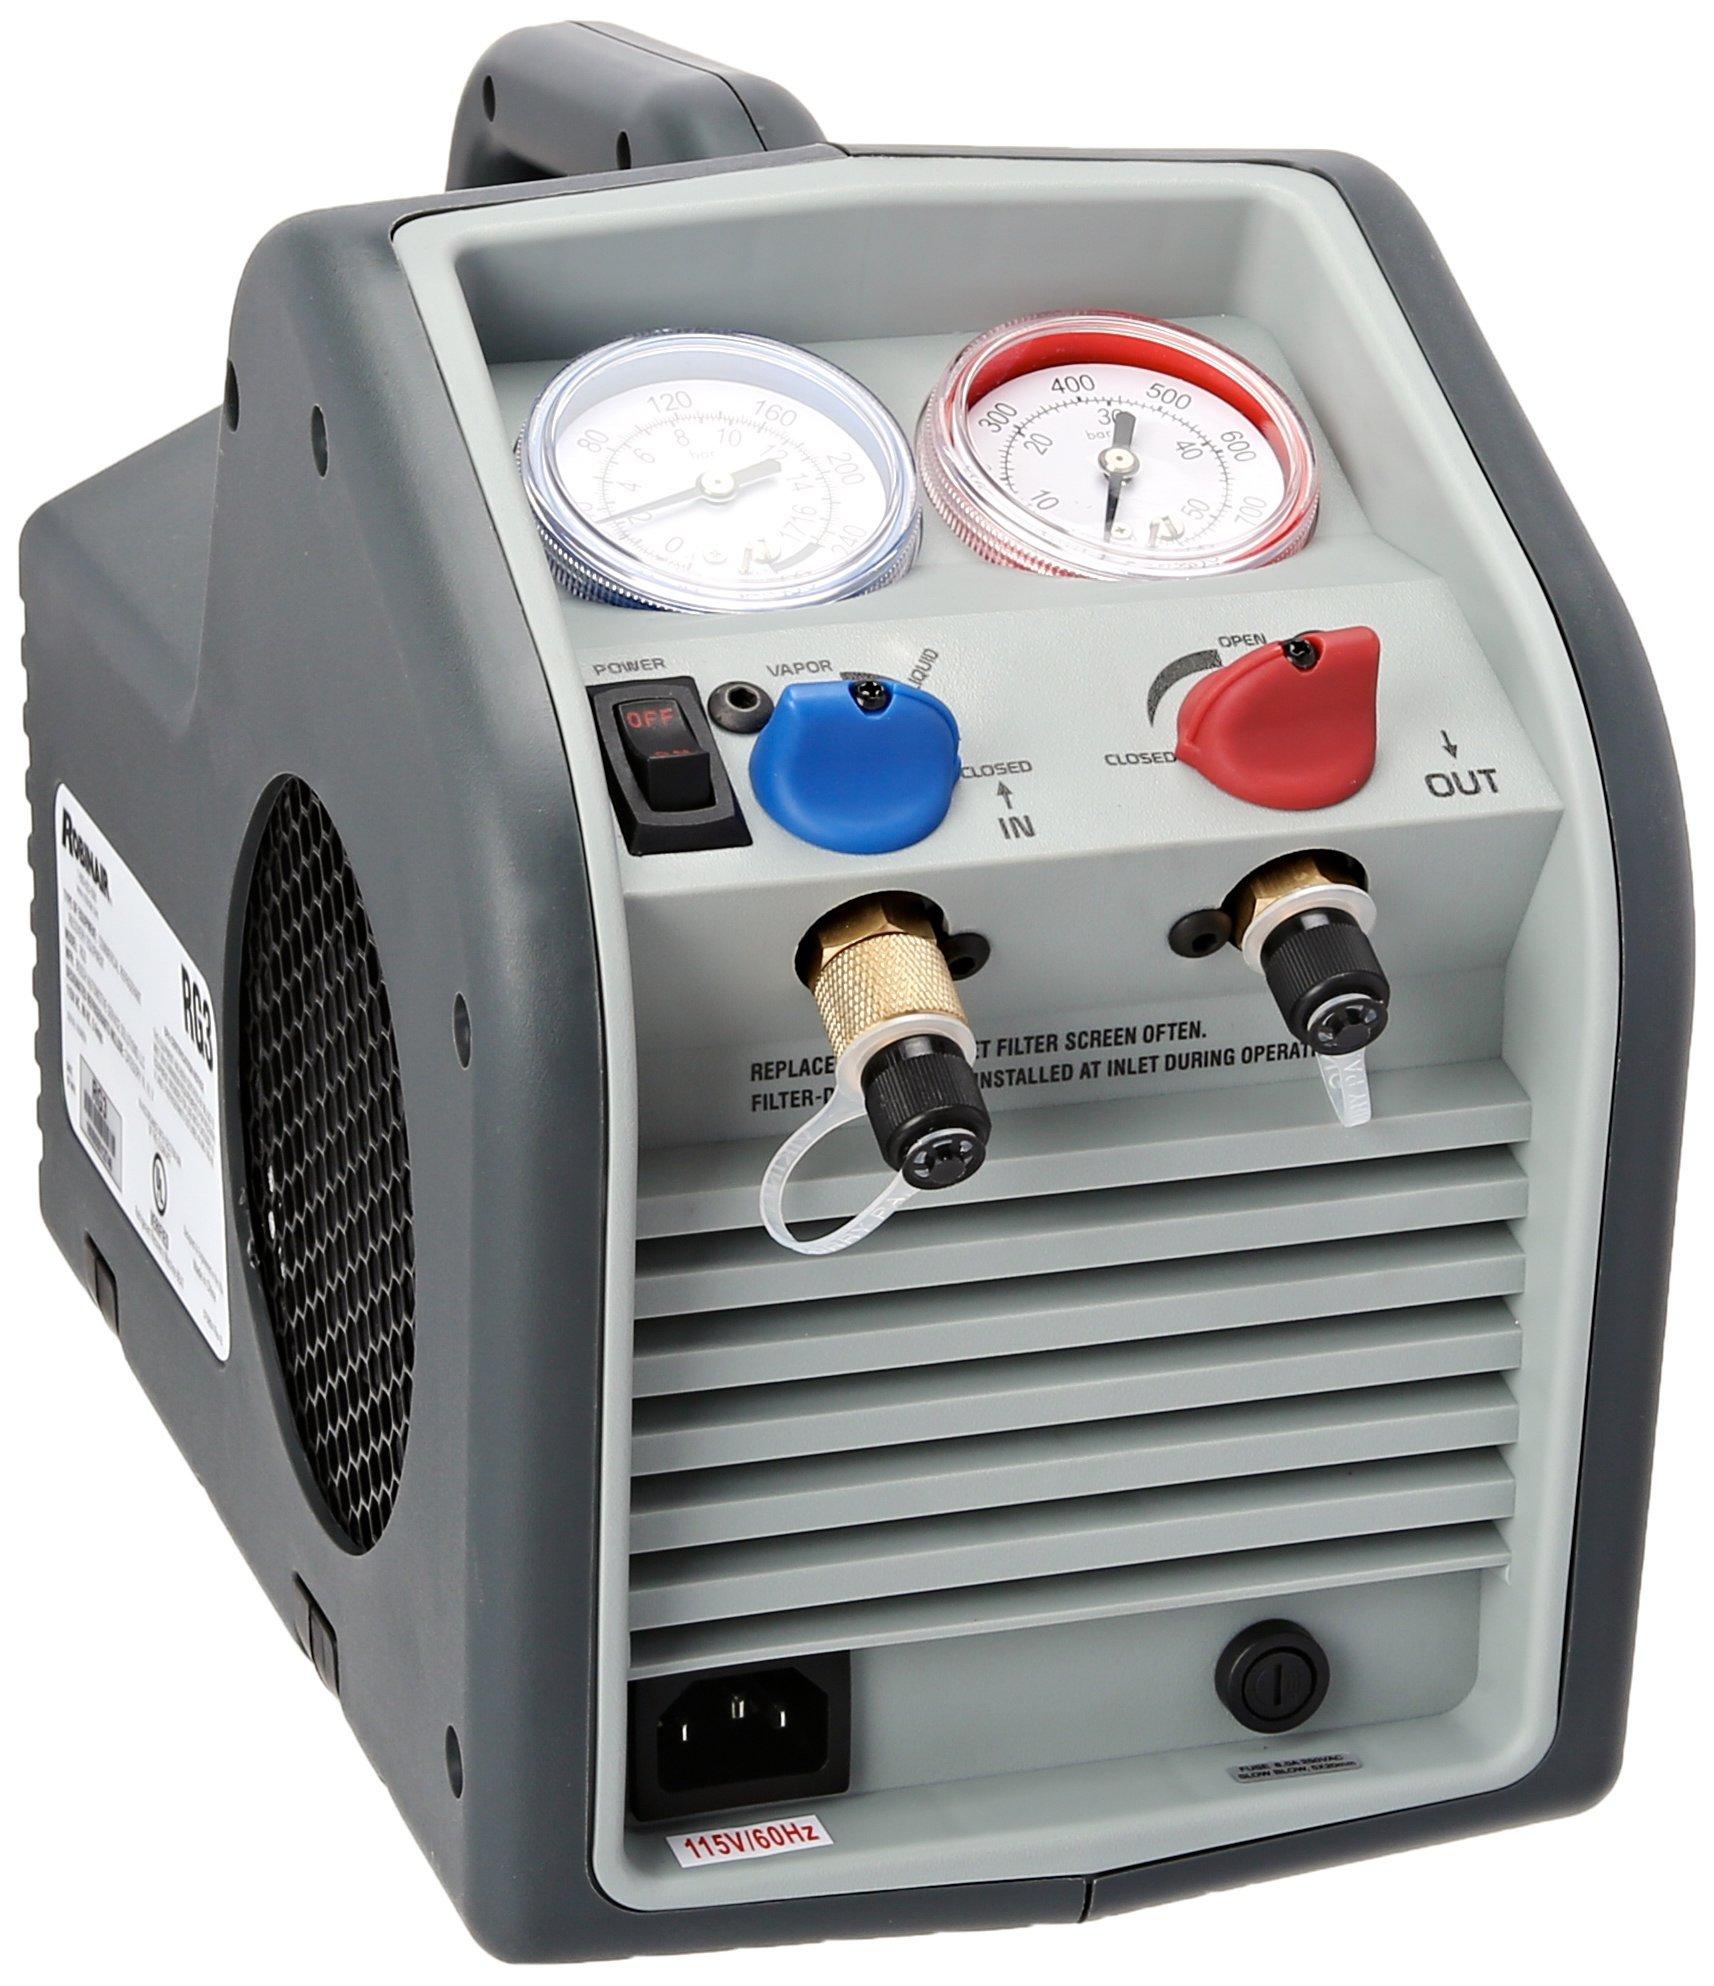 Robinair RG3 Twin-Cylinder Portable Refrigerant Recovery Machine - 115V AC, 60 Hz by Robinair (Image #1)